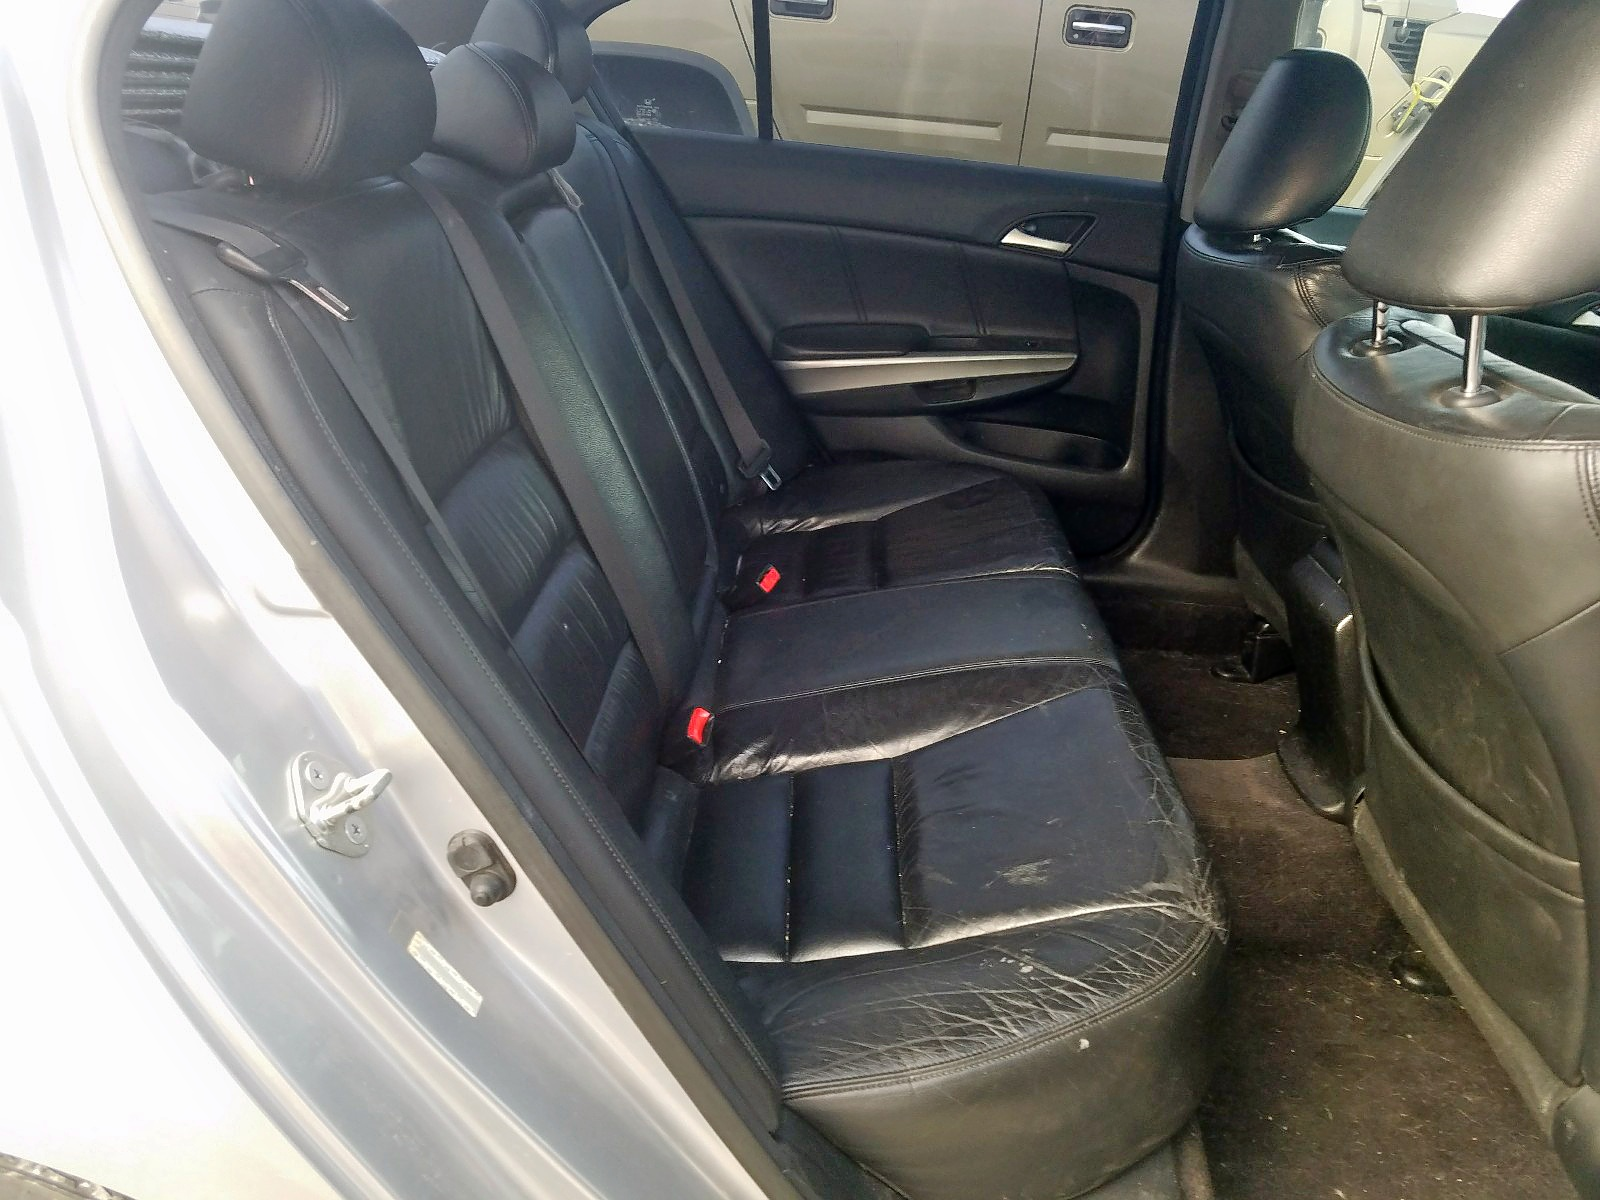 JHMCP26898C039017 - 2008 Honda Accord Exl 2.4L detail view